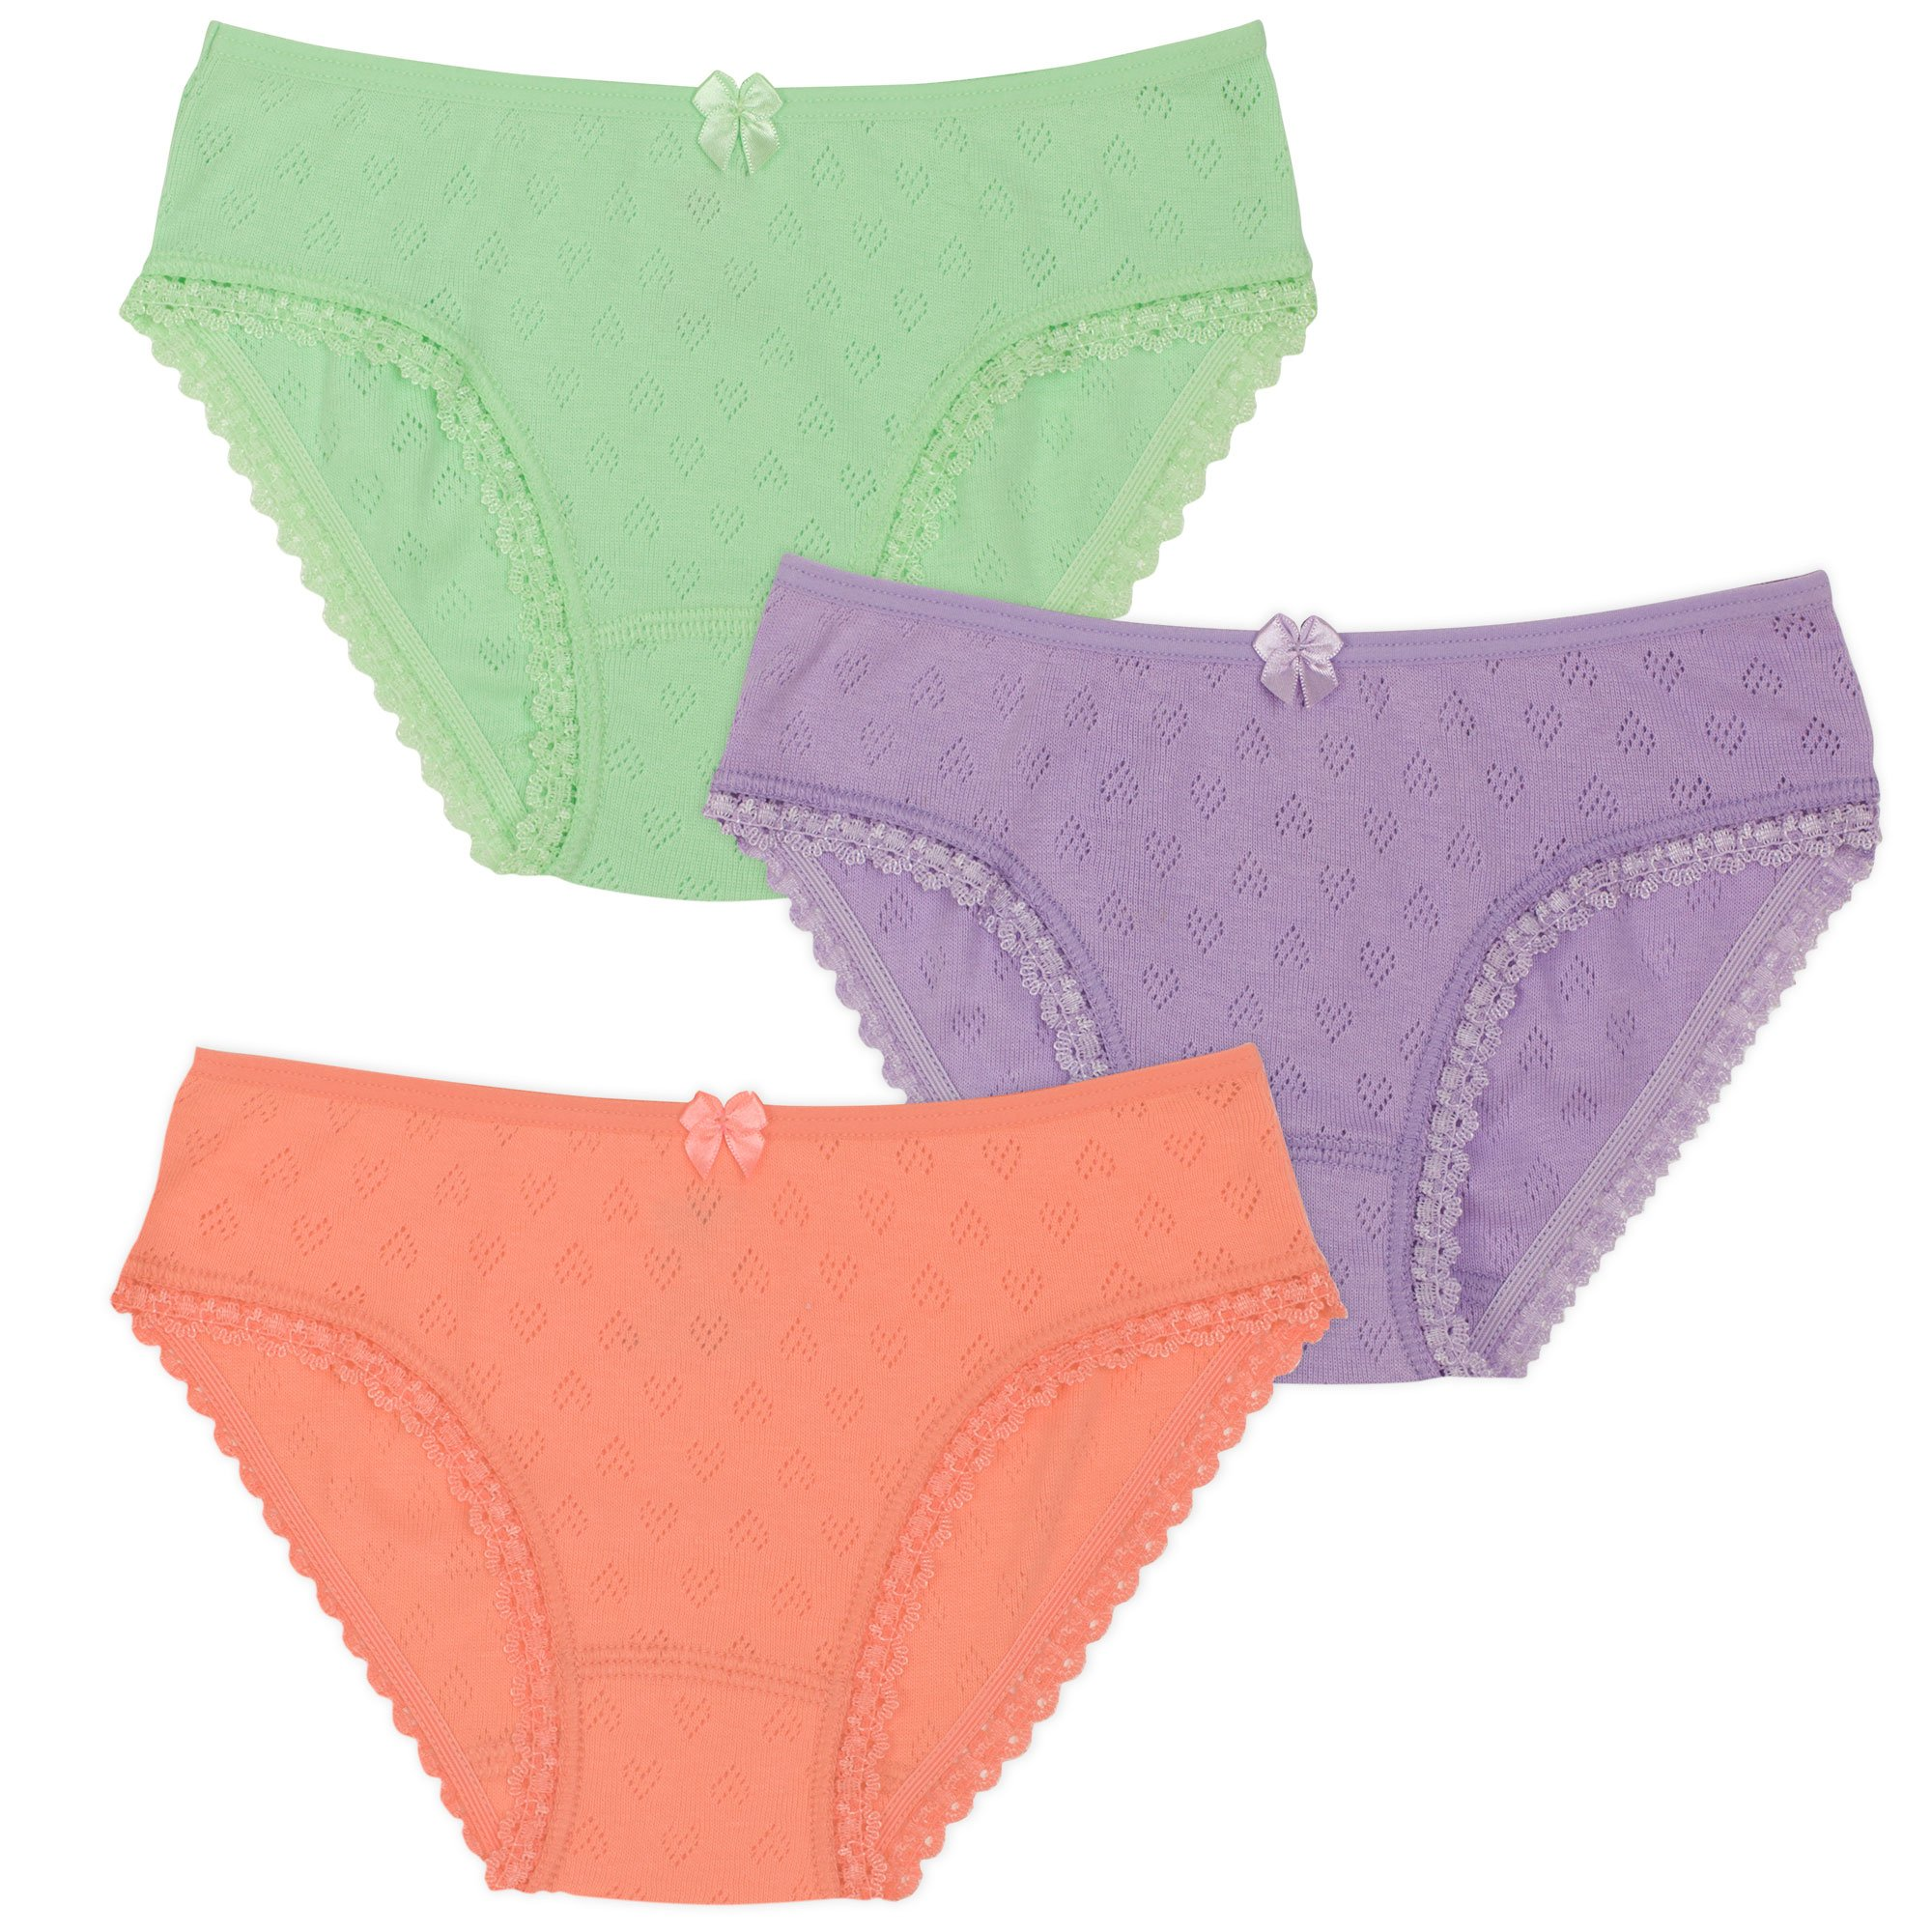 Lucky & Me Lily Little Girls Underwear, Organic Cotton Briefs, Cotton Candy, 3-Pack, 2/3